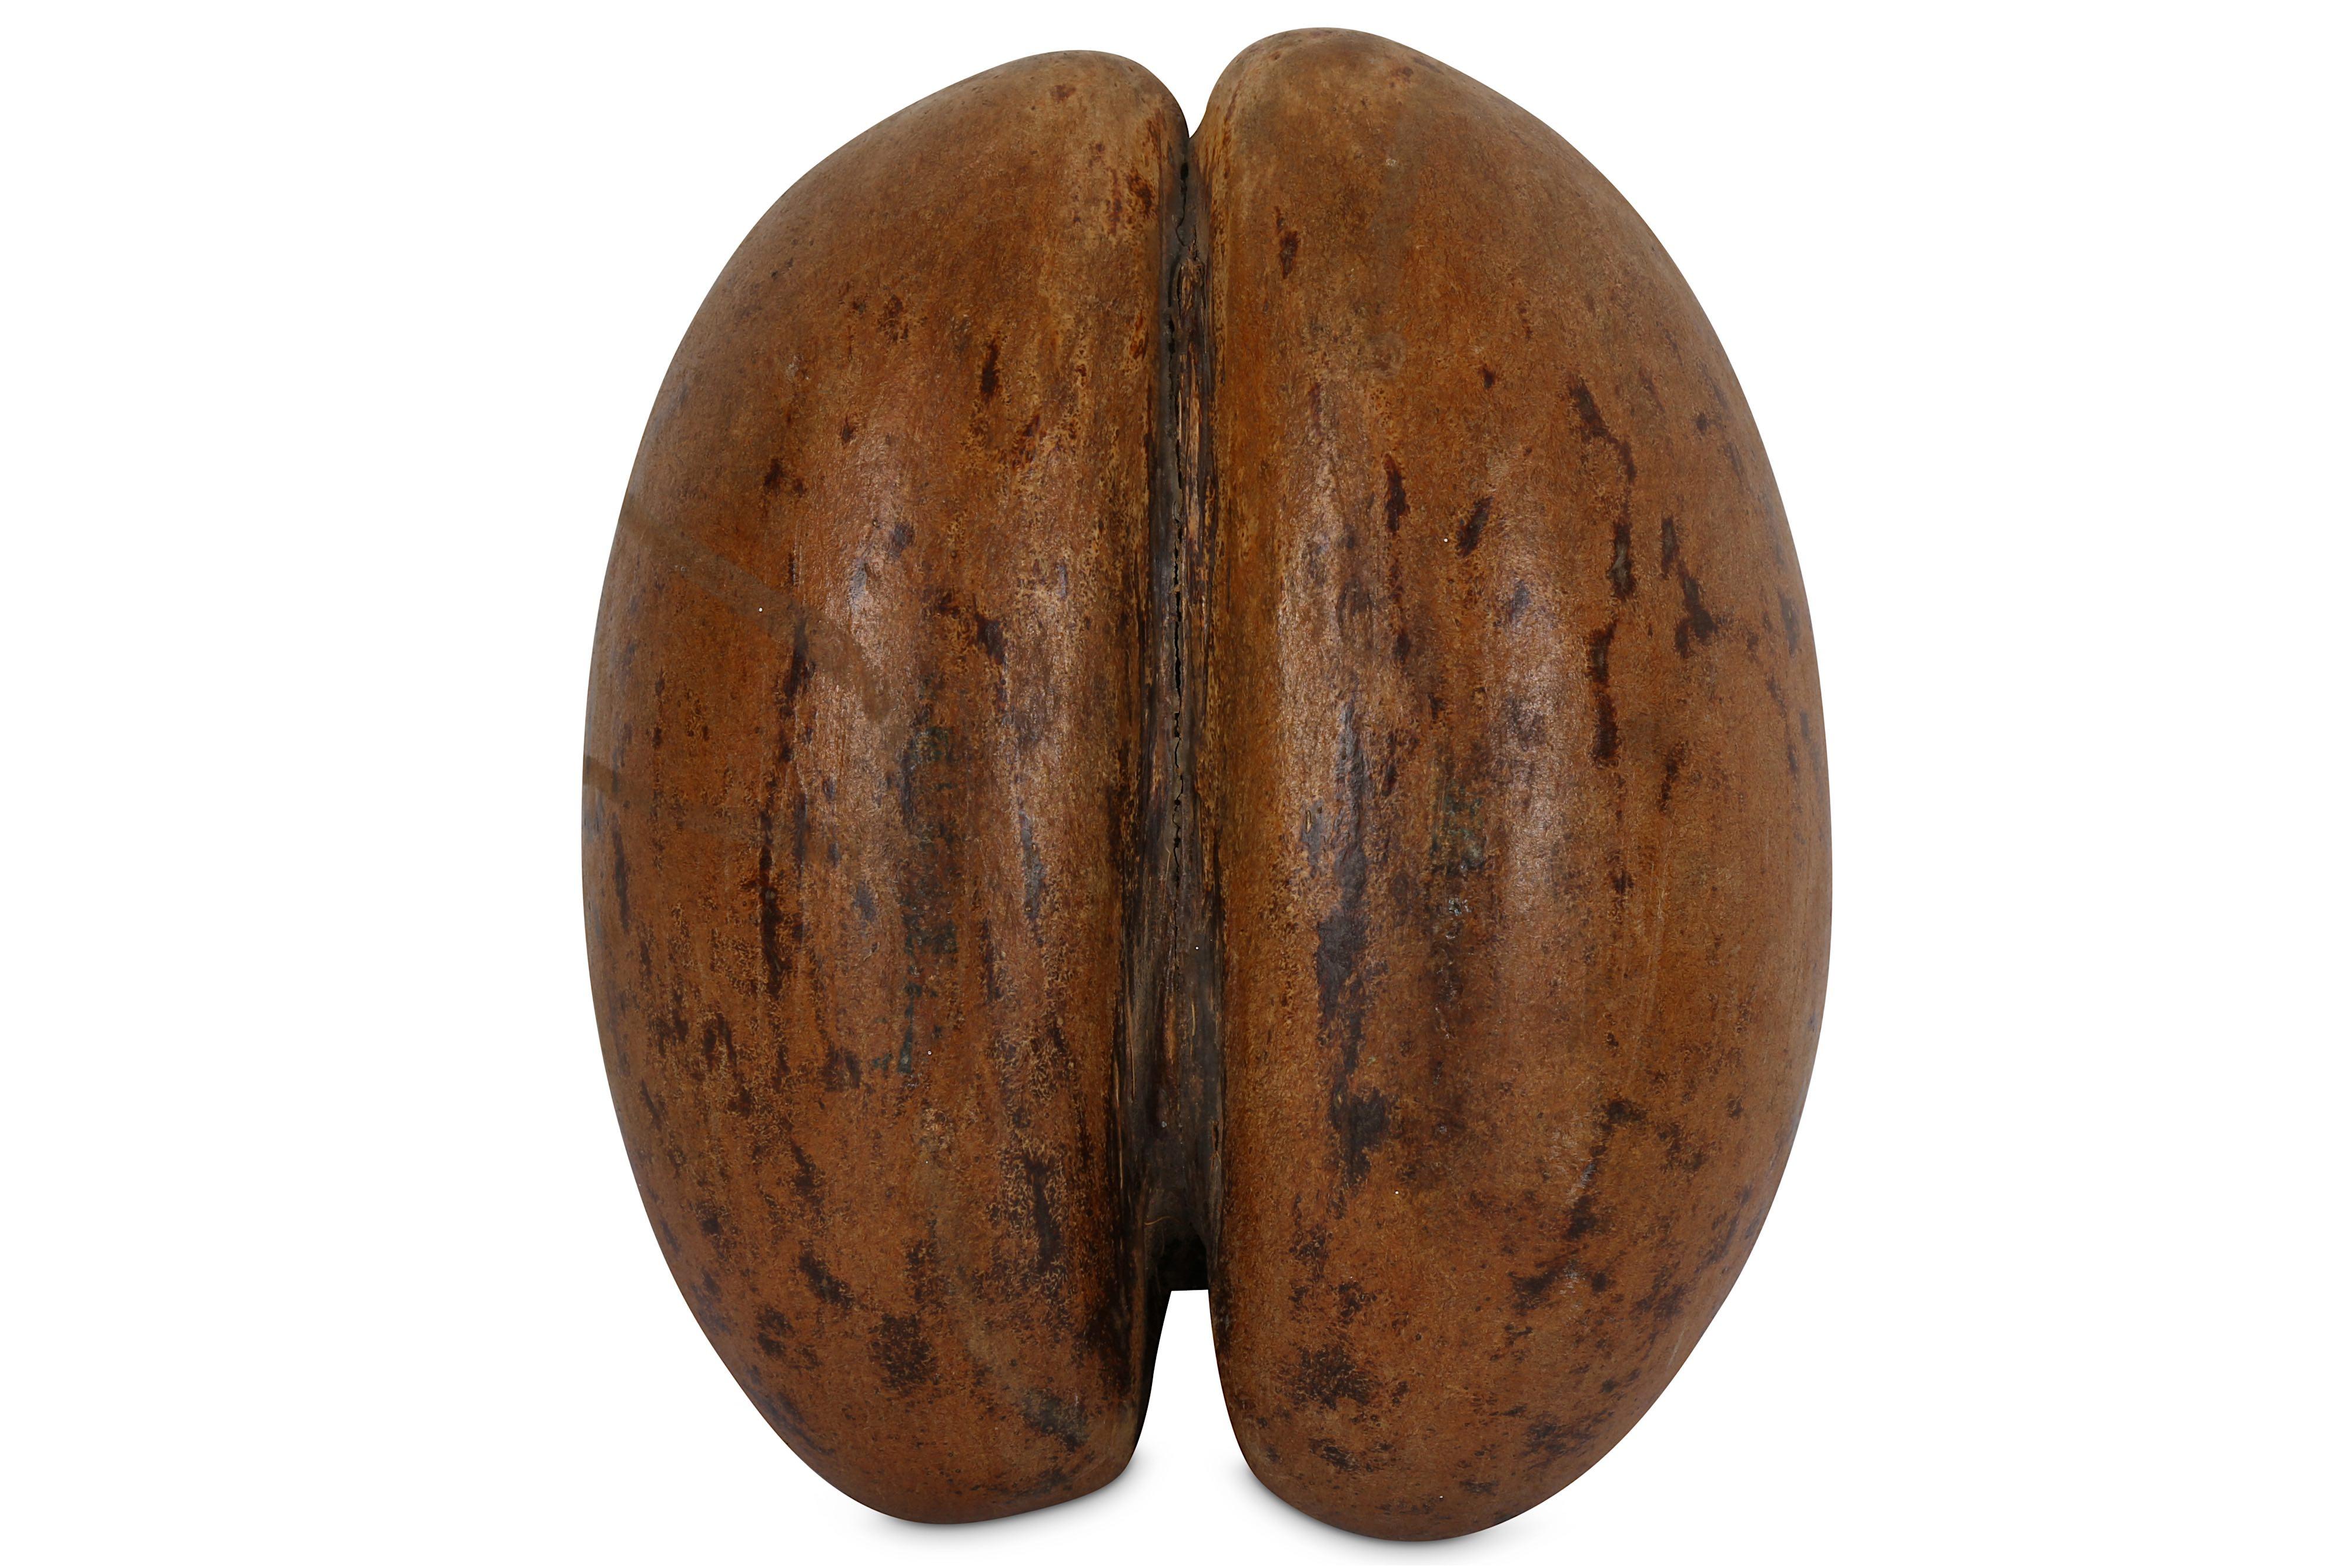 A POLISHED COCO DE MER NUT (LODOICEA MALDIVICA) - Image 3 of 3